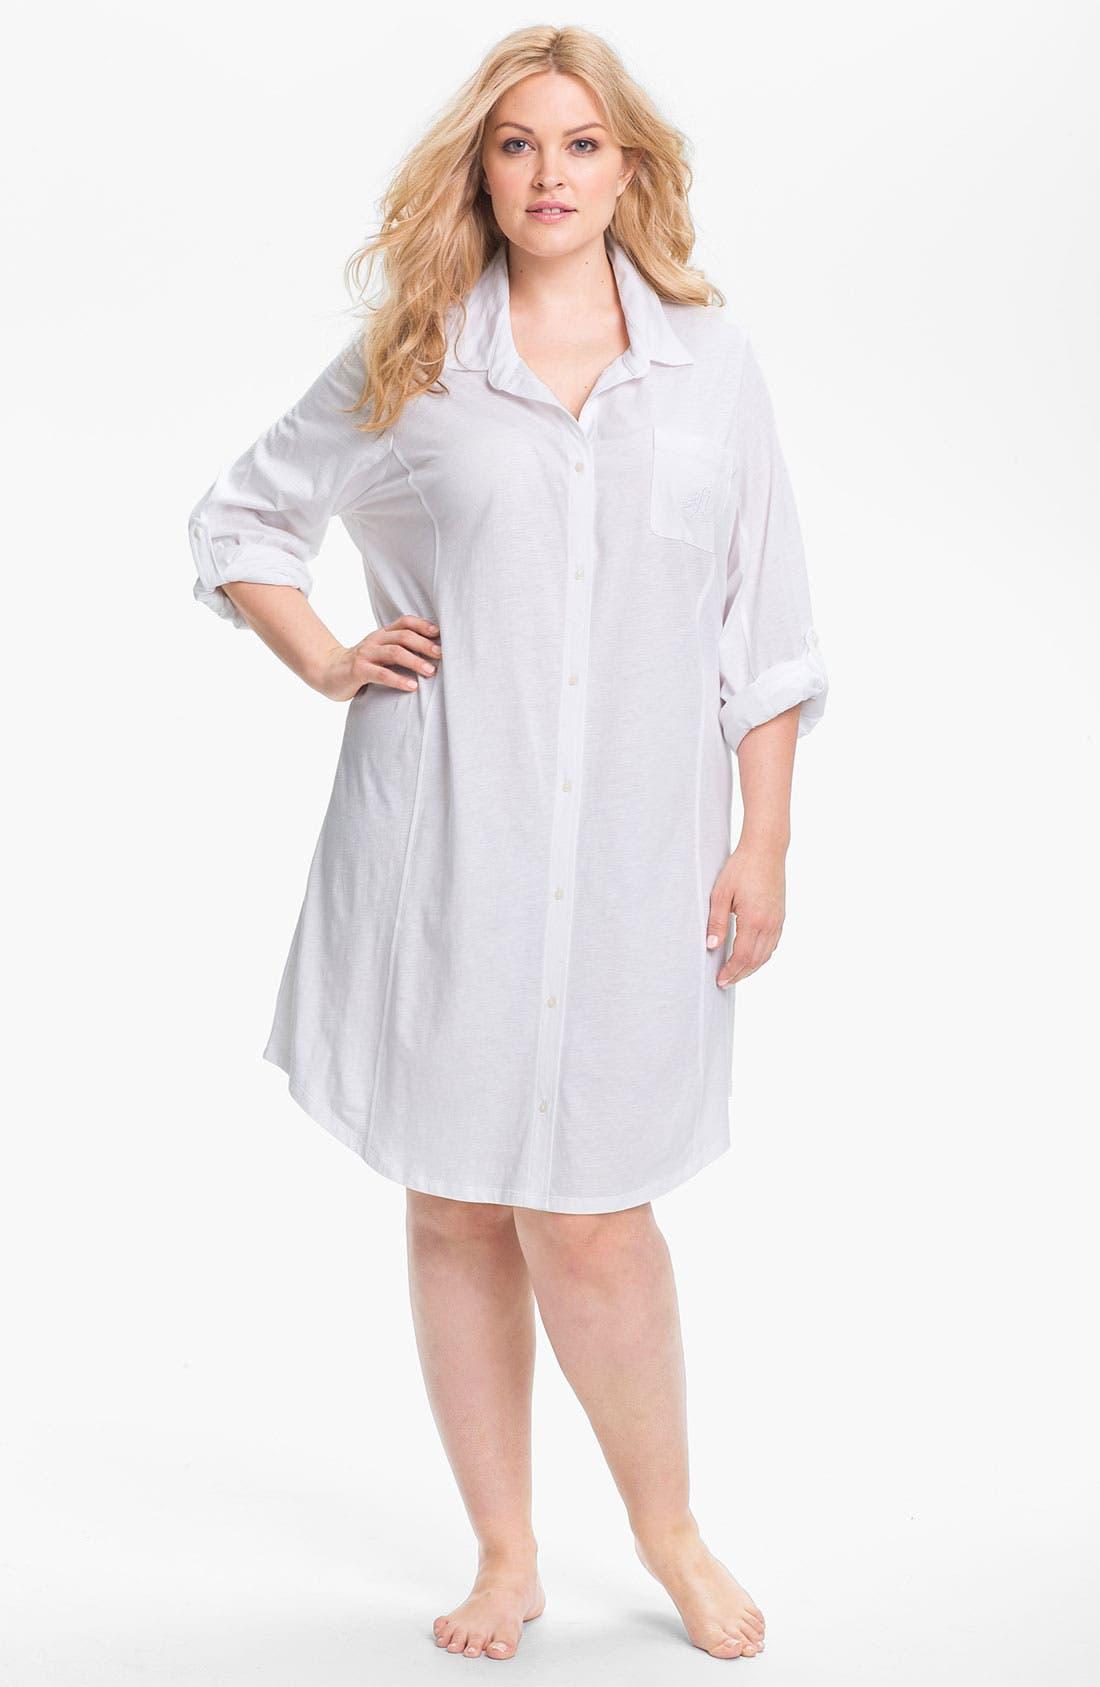 Main Image - Lauren Ralph Lauren Sleepwear Knit Nightshirt (Plus)